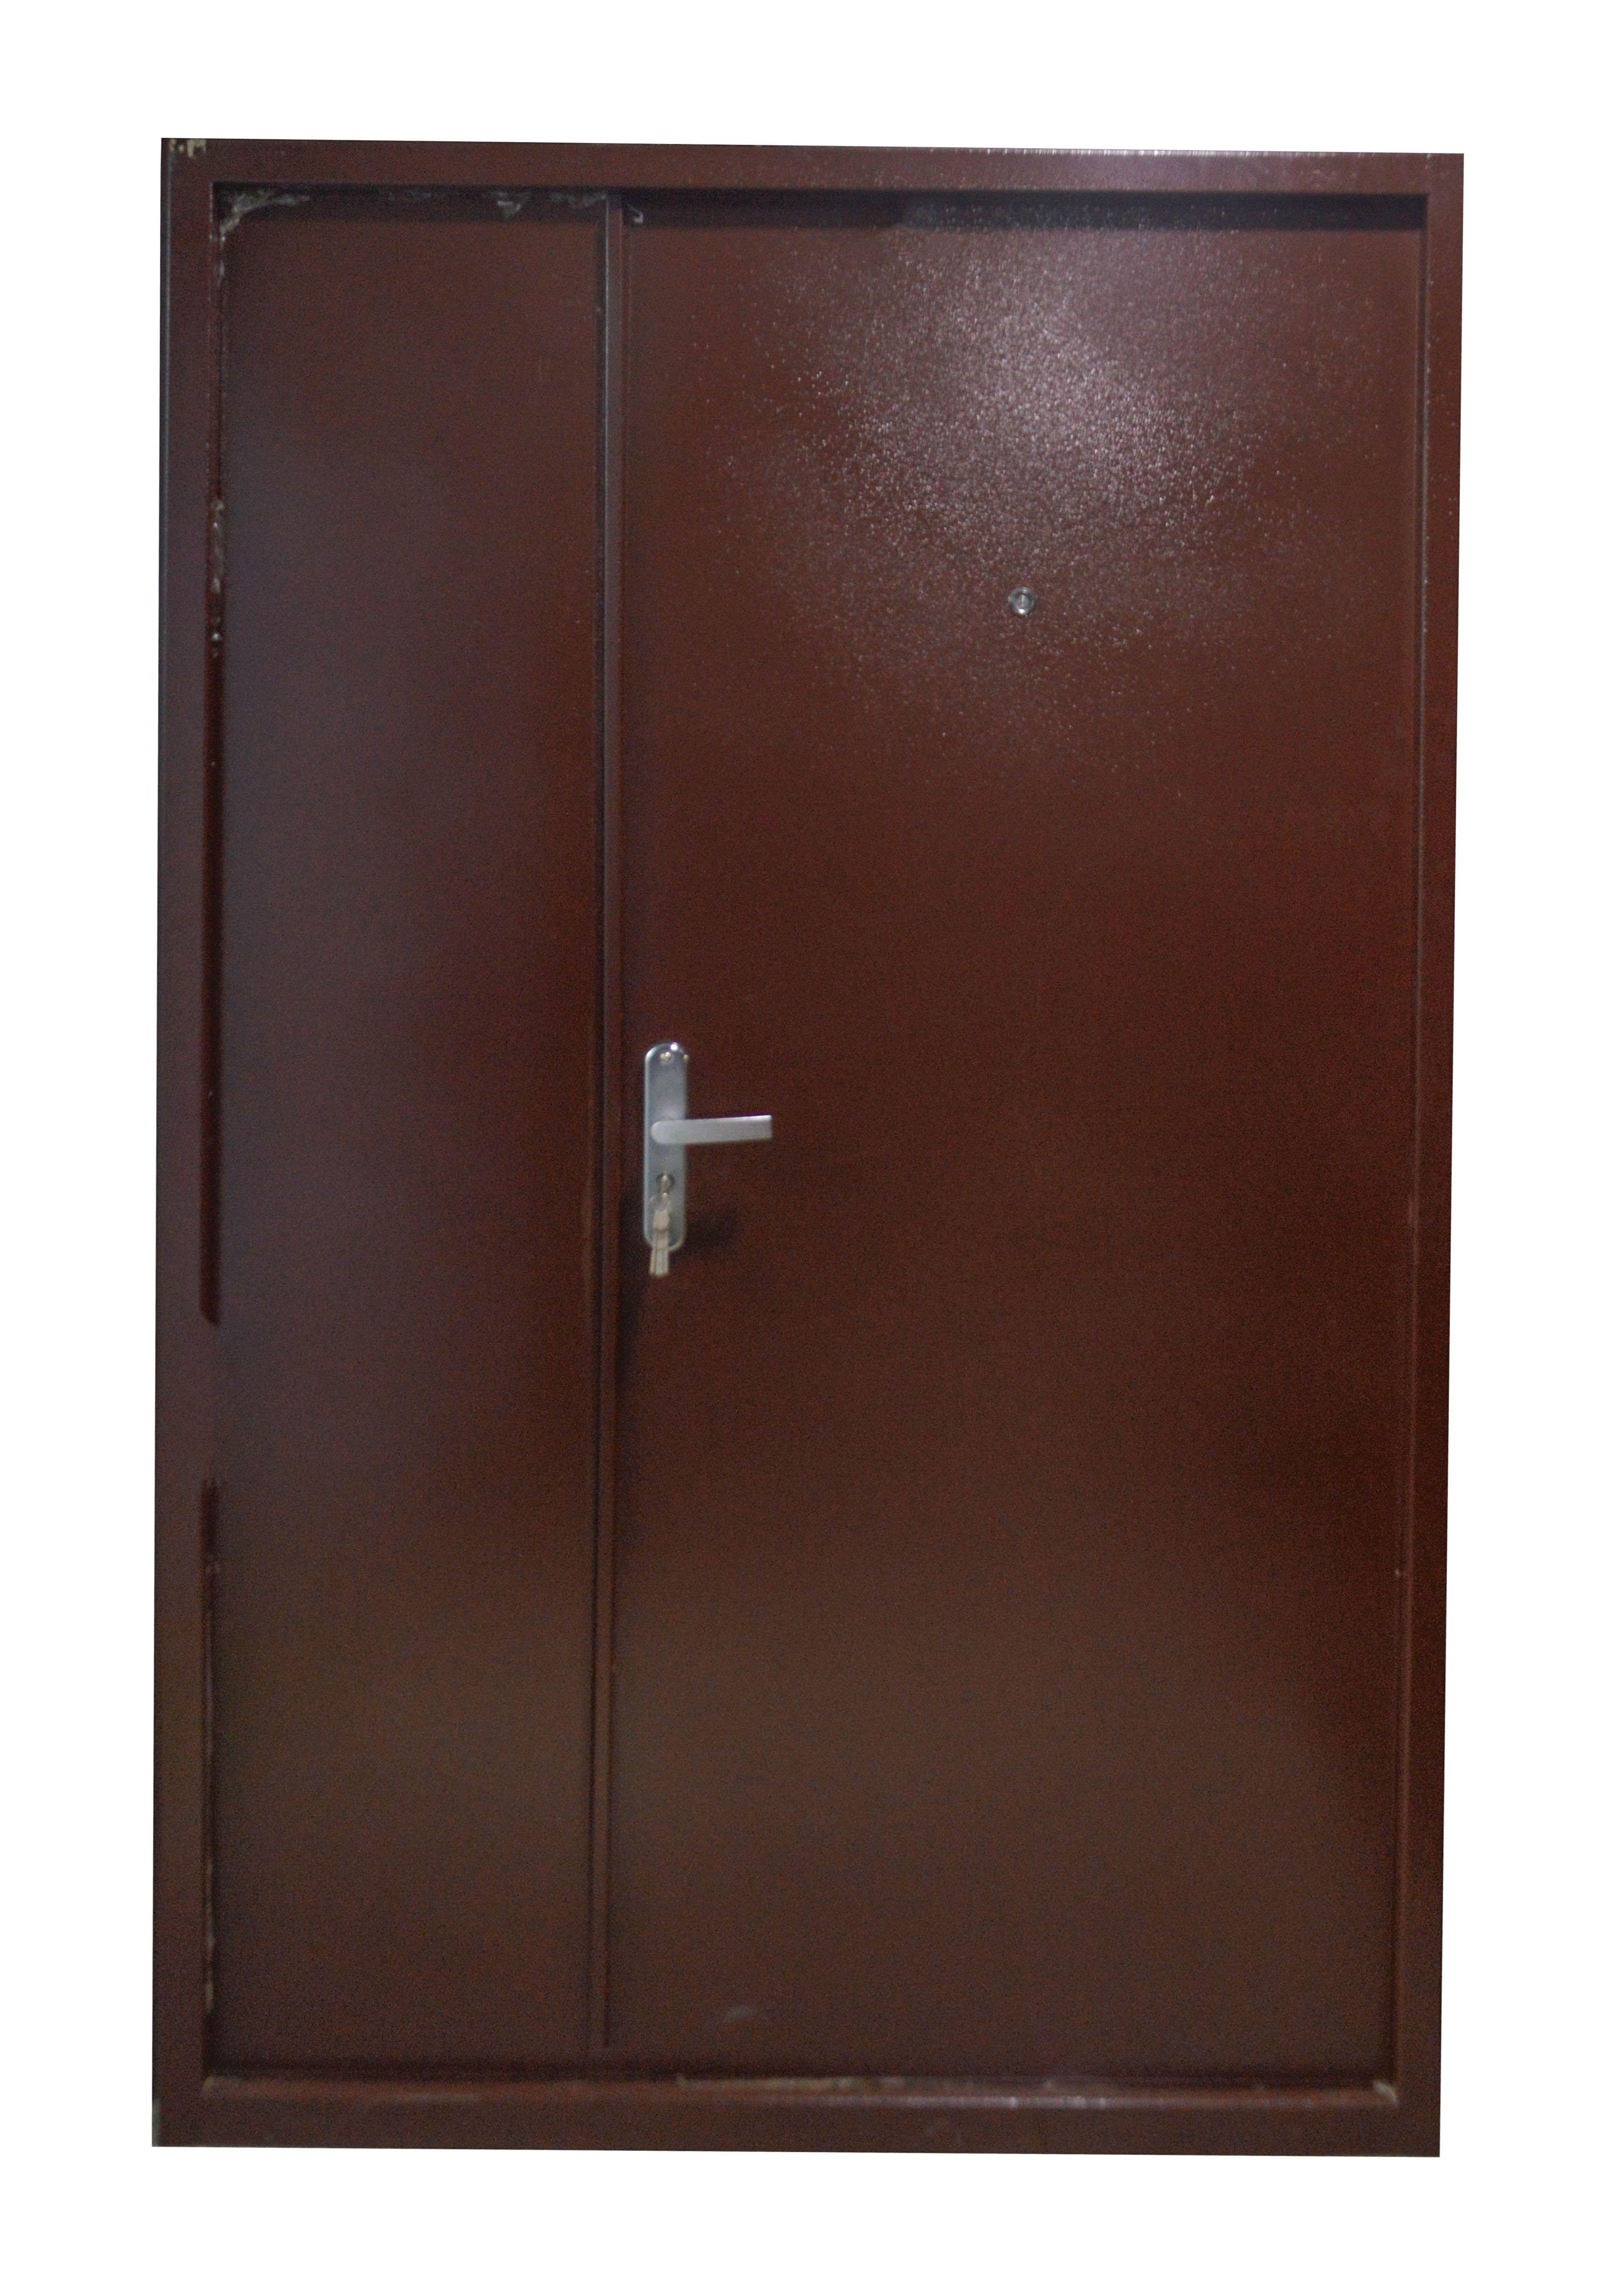 Gl Sd 001 Topaz Steel Door Plain Brown 1 2mmx80mm